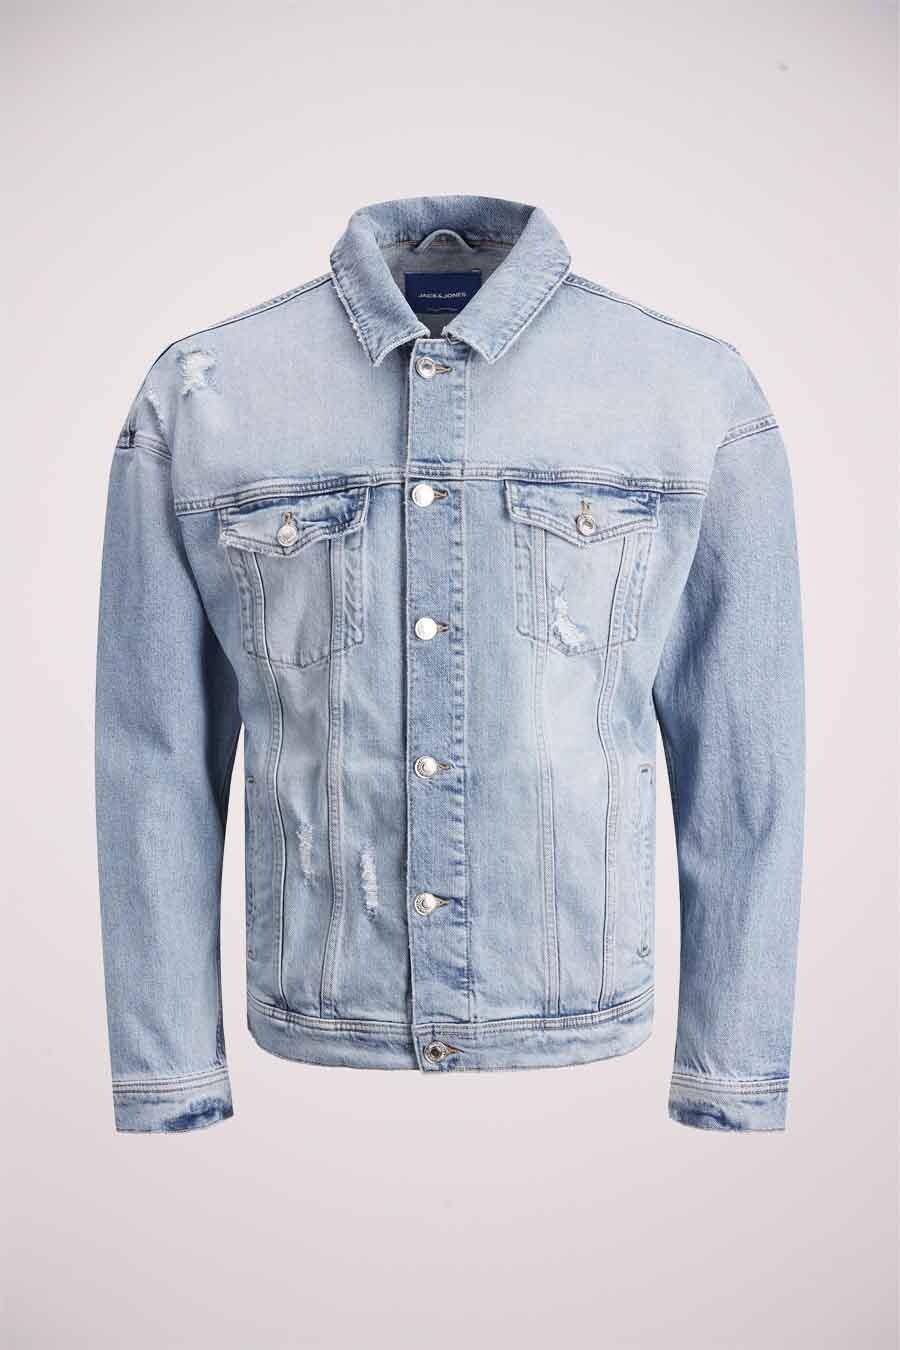 Jack & Jones Jeans Intelligence Jas jeans, Denim, Heren, Maat: L/M/S/XL